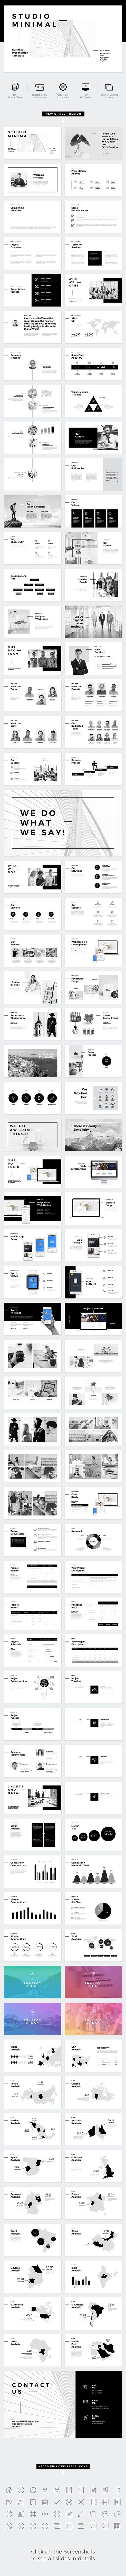 Studio Minimal Presentation Powerpoint Template  Business